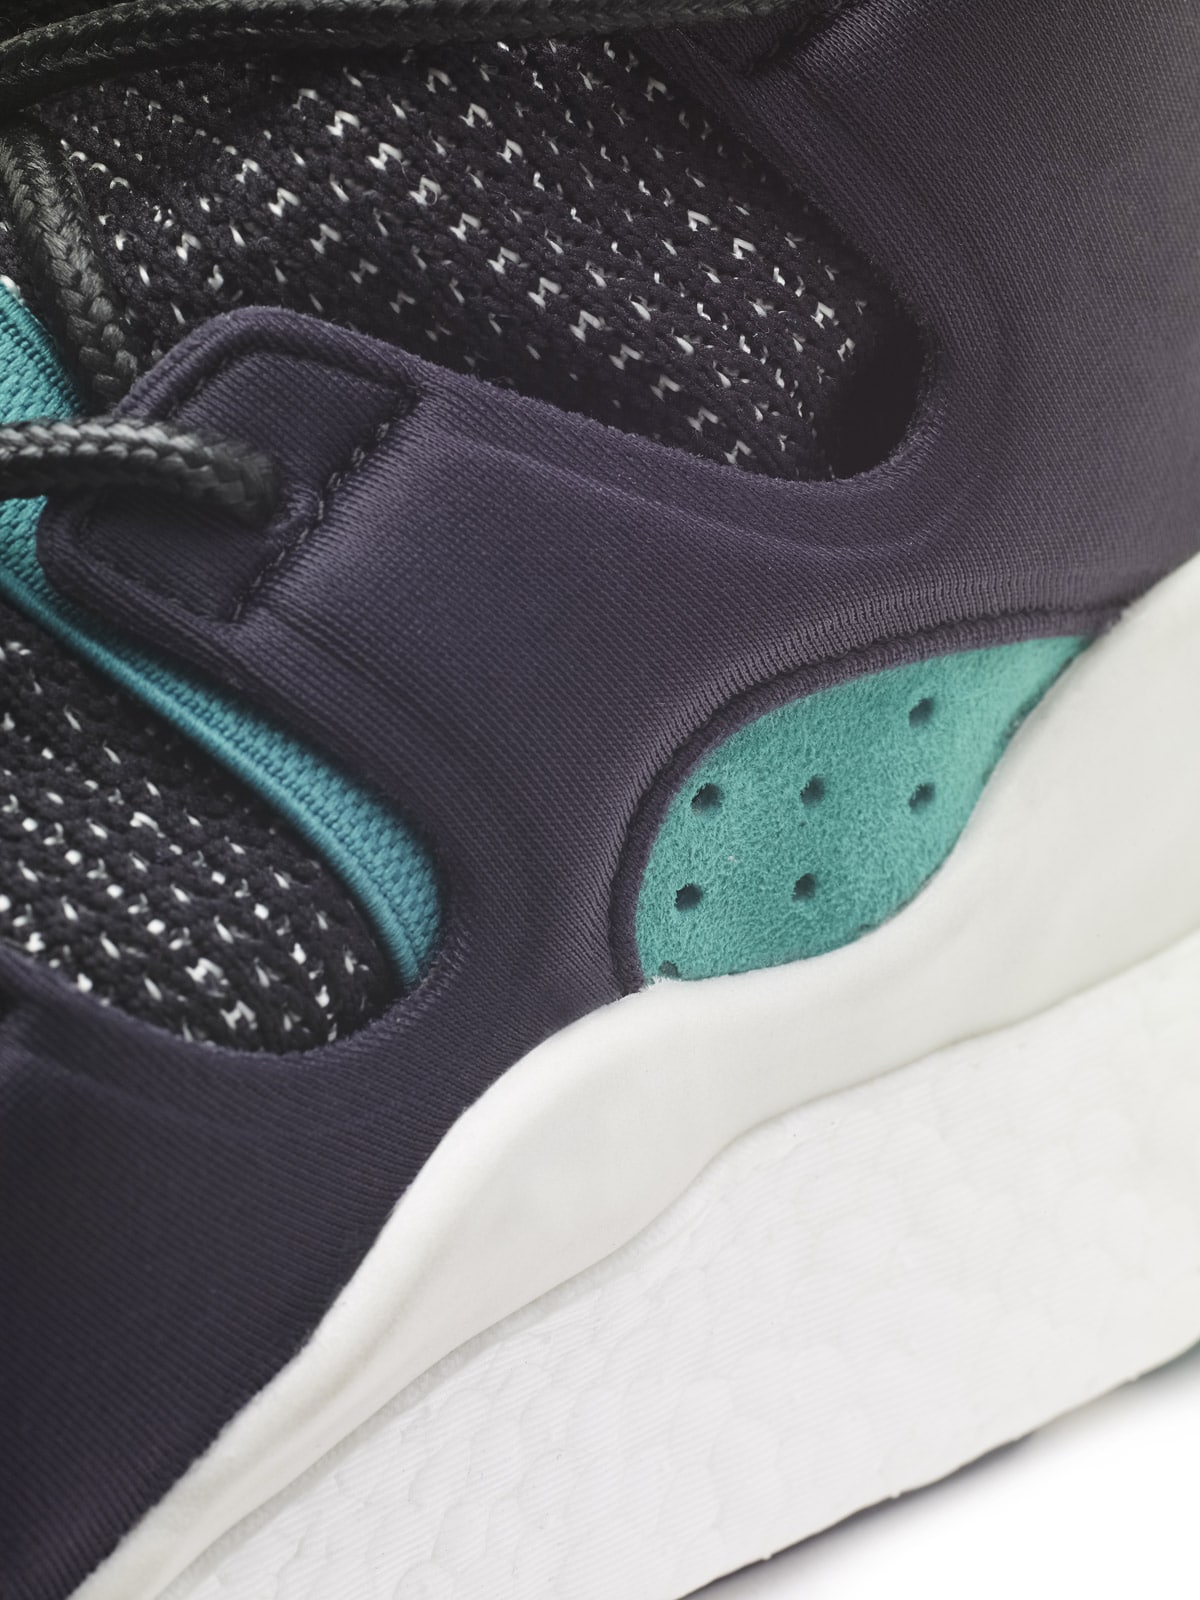 adidas Originals Statement EQT #3F15 Collection-5